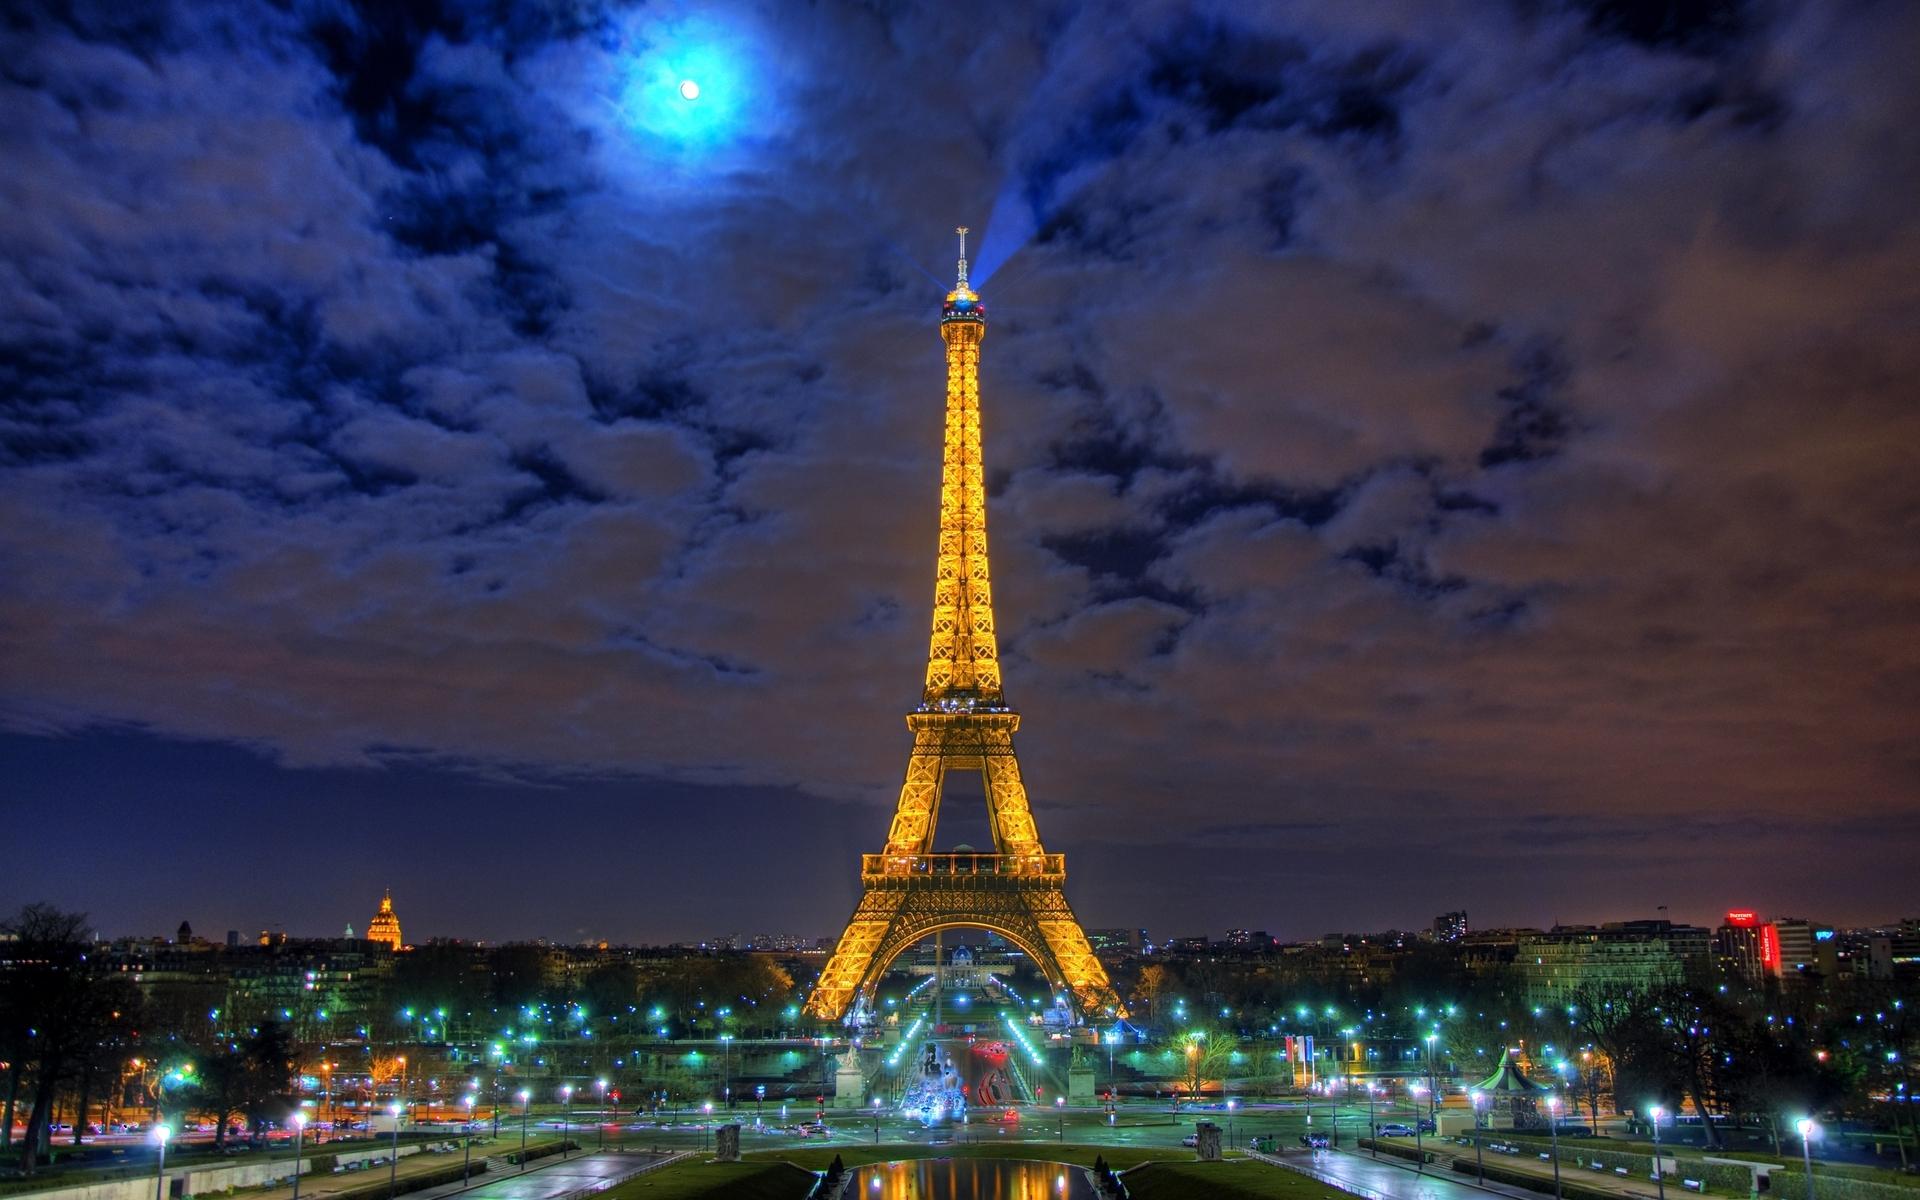 Париж, Эйфелева башня, ночь